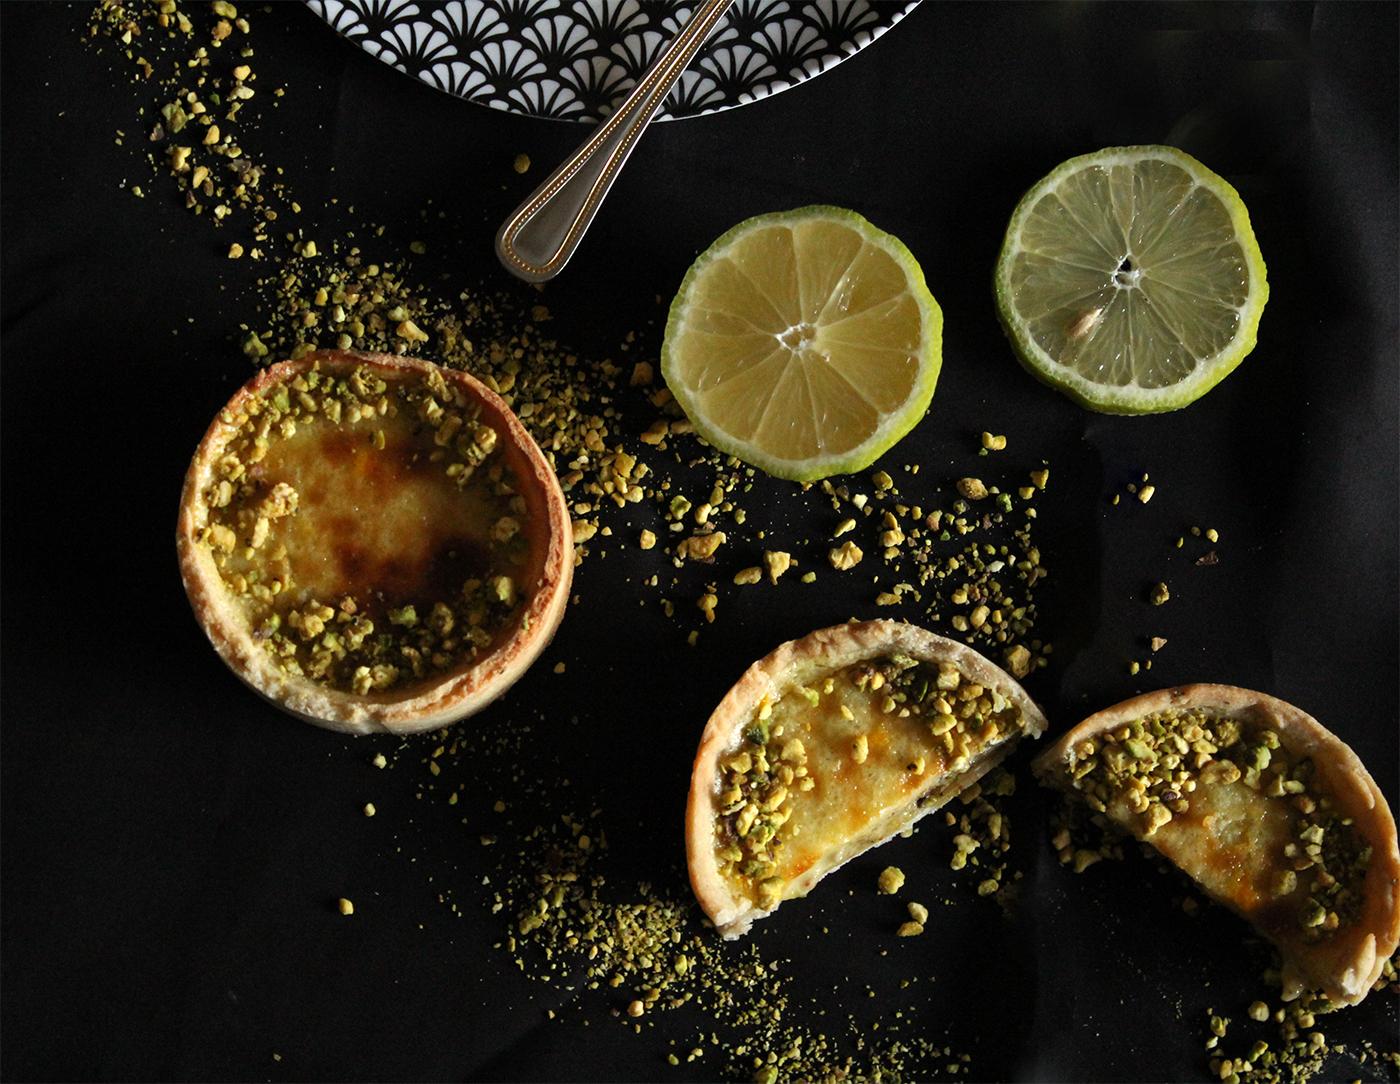 IMG 7886 - טרטלת לימון